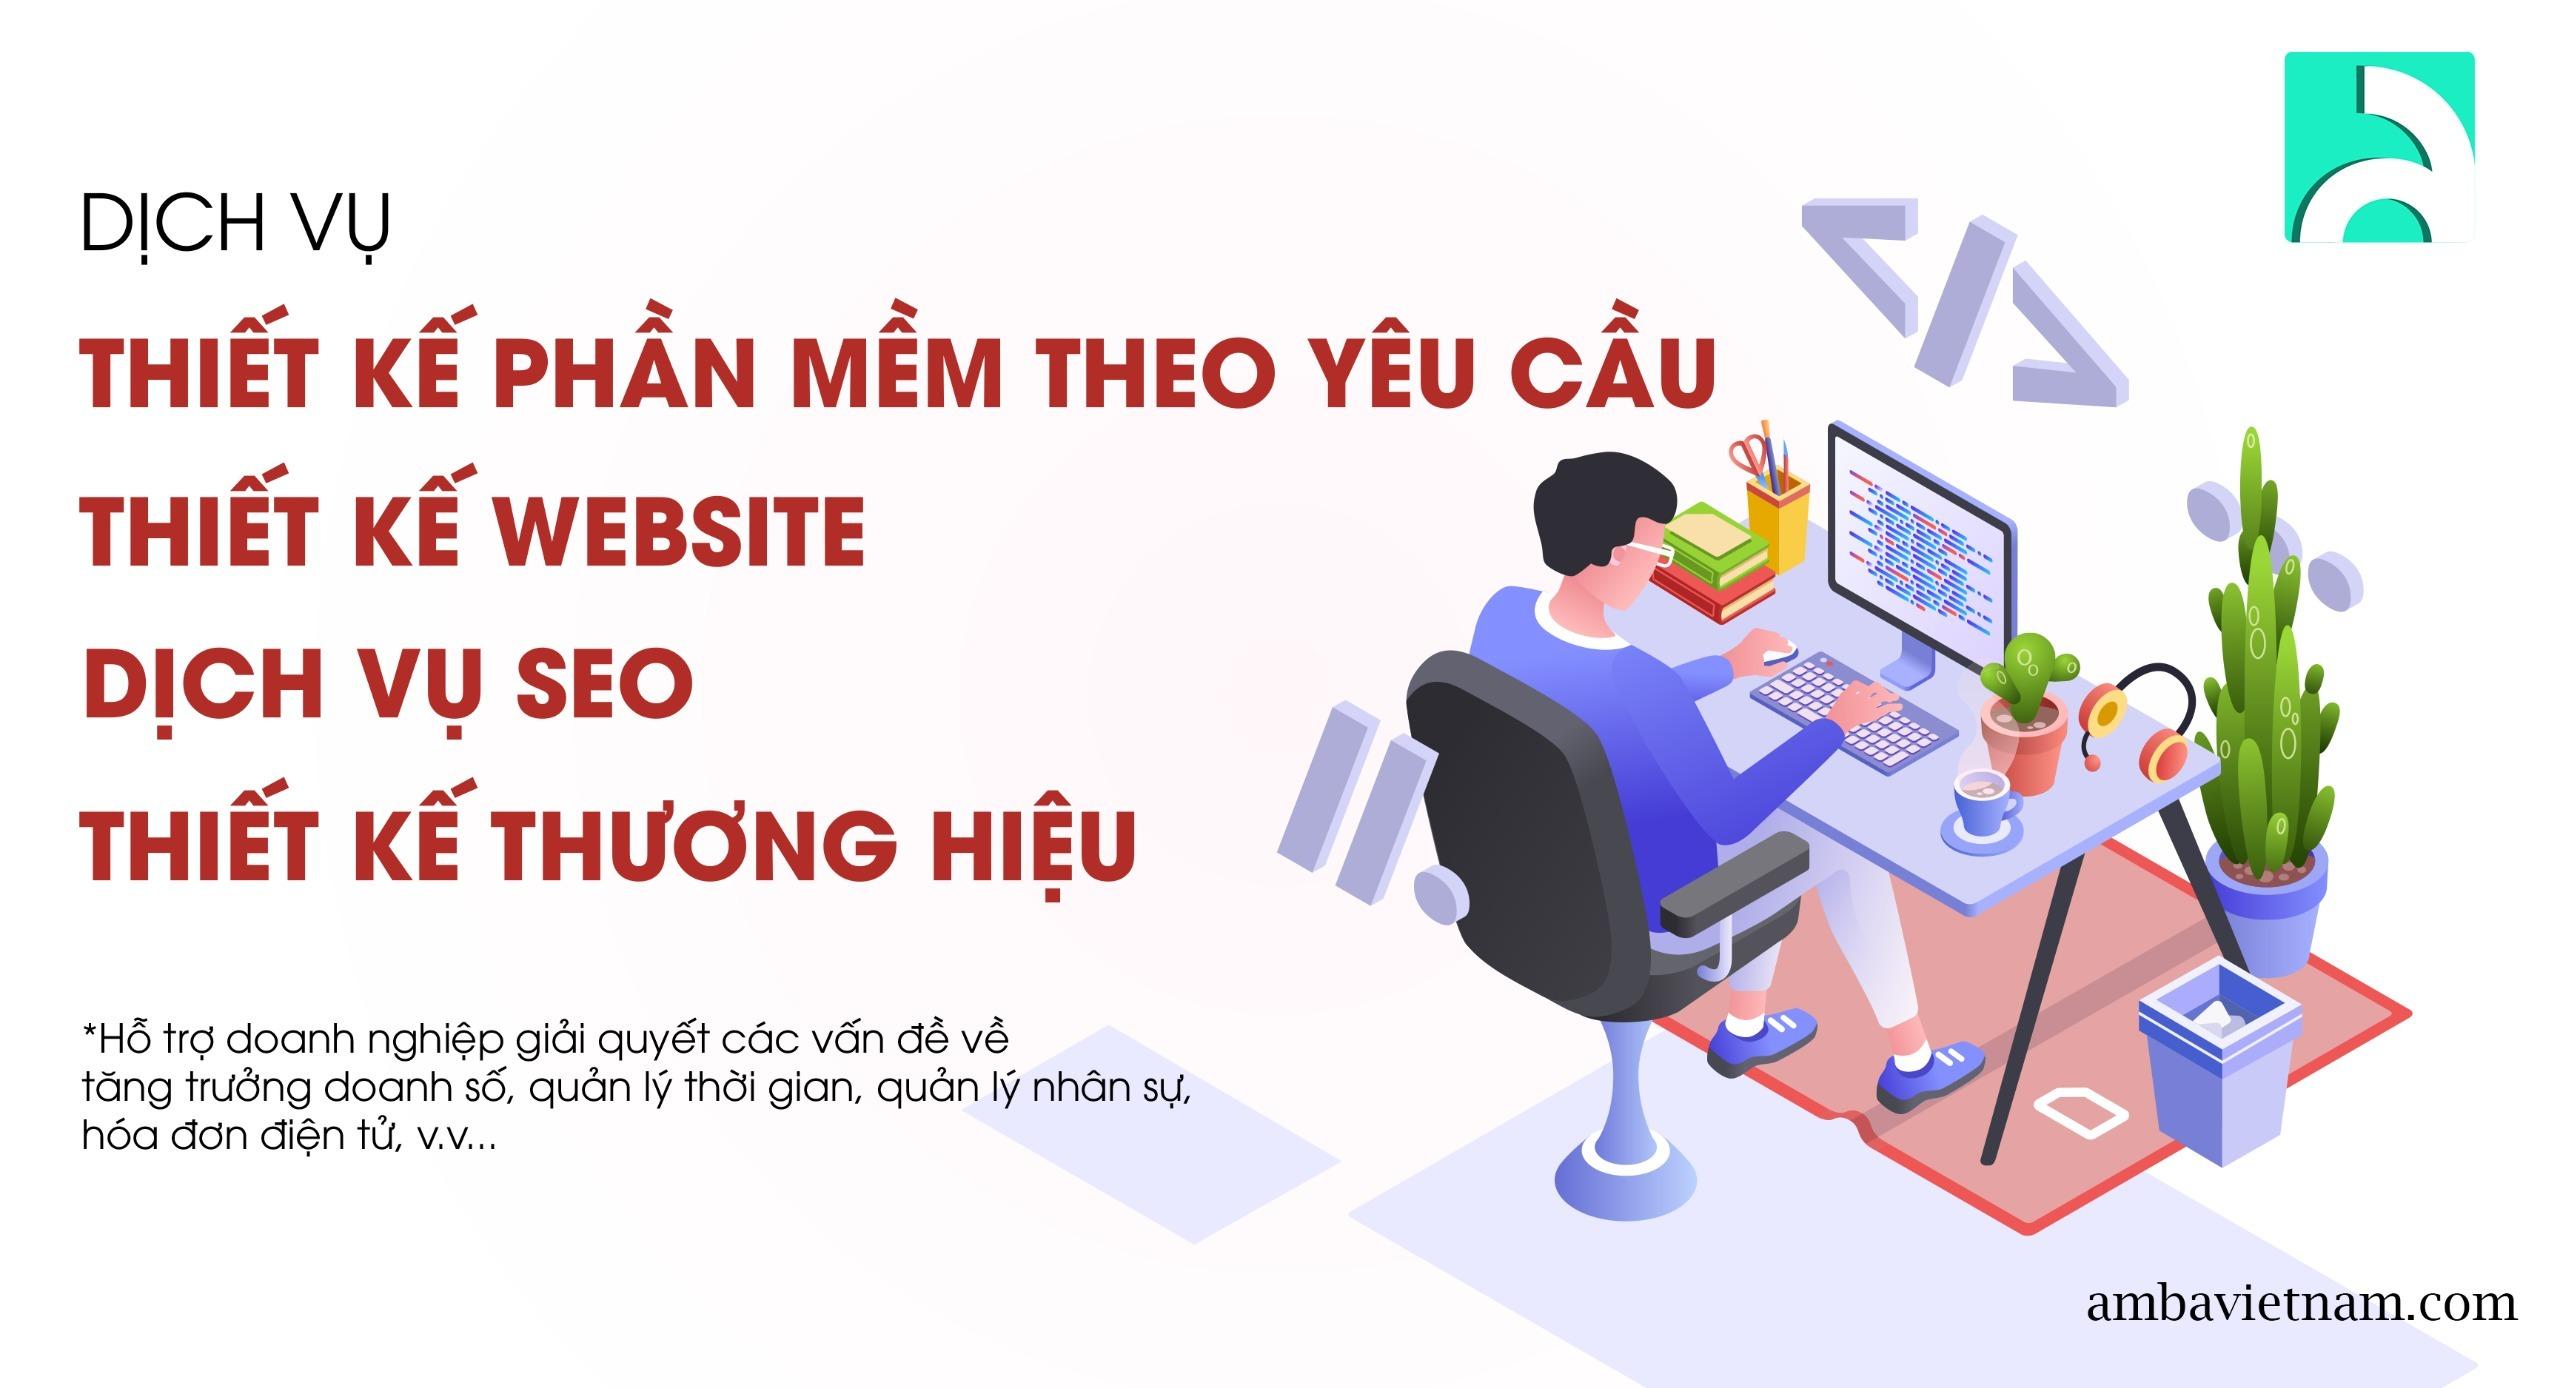 Viết Phần Mềm Tphcm (@vietphanmemtphcm) Cover Image